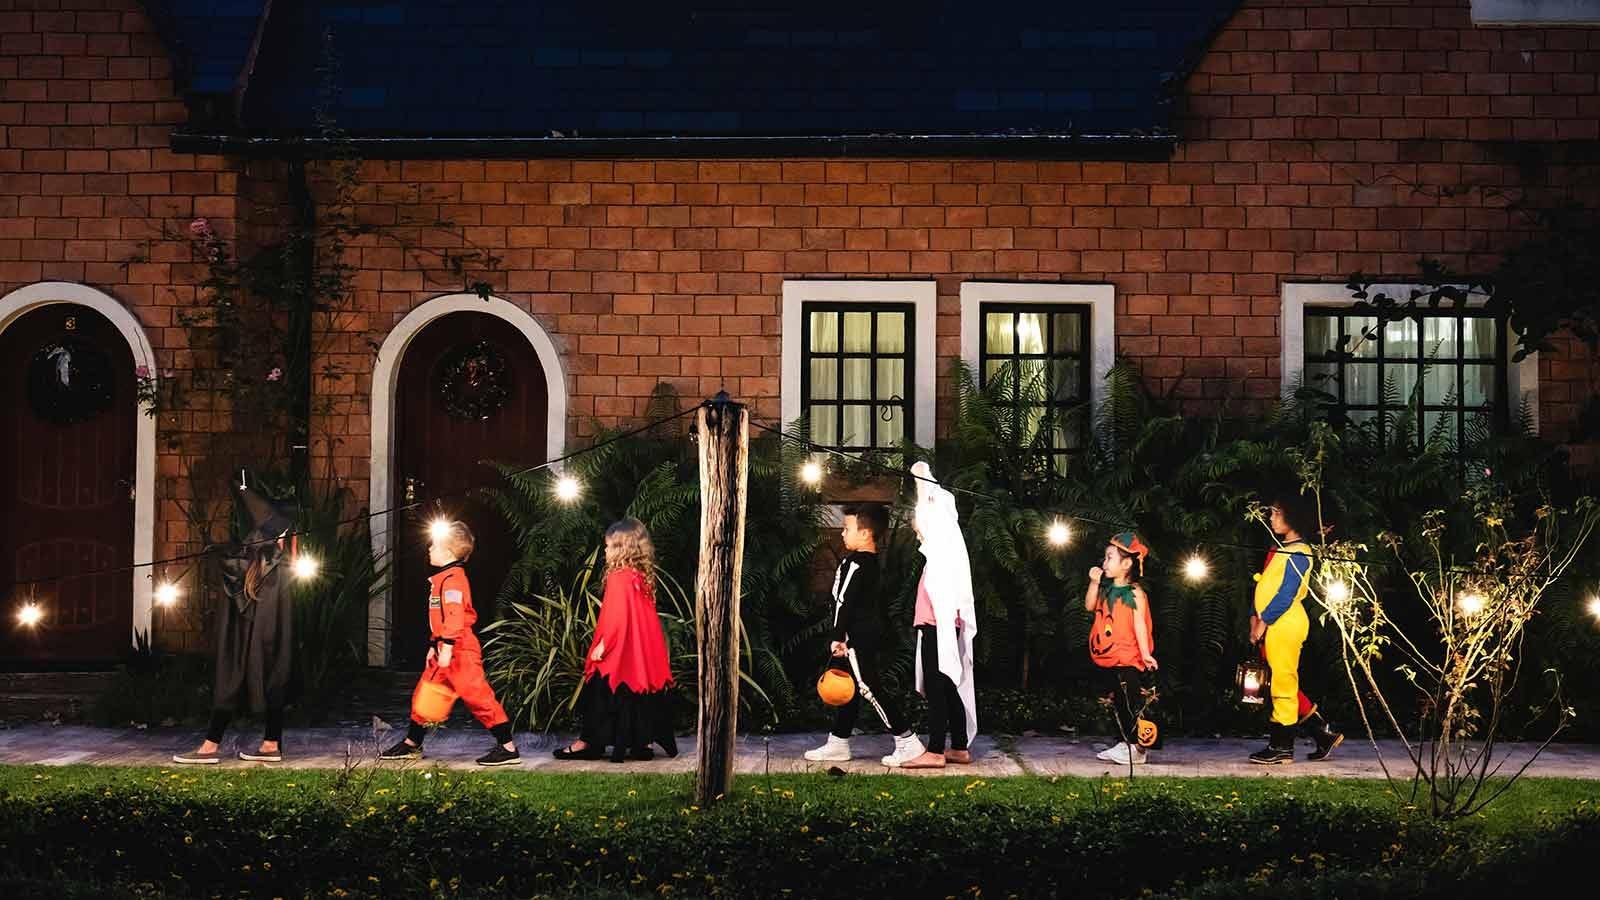 kids walking down a sidewalk lined with lights